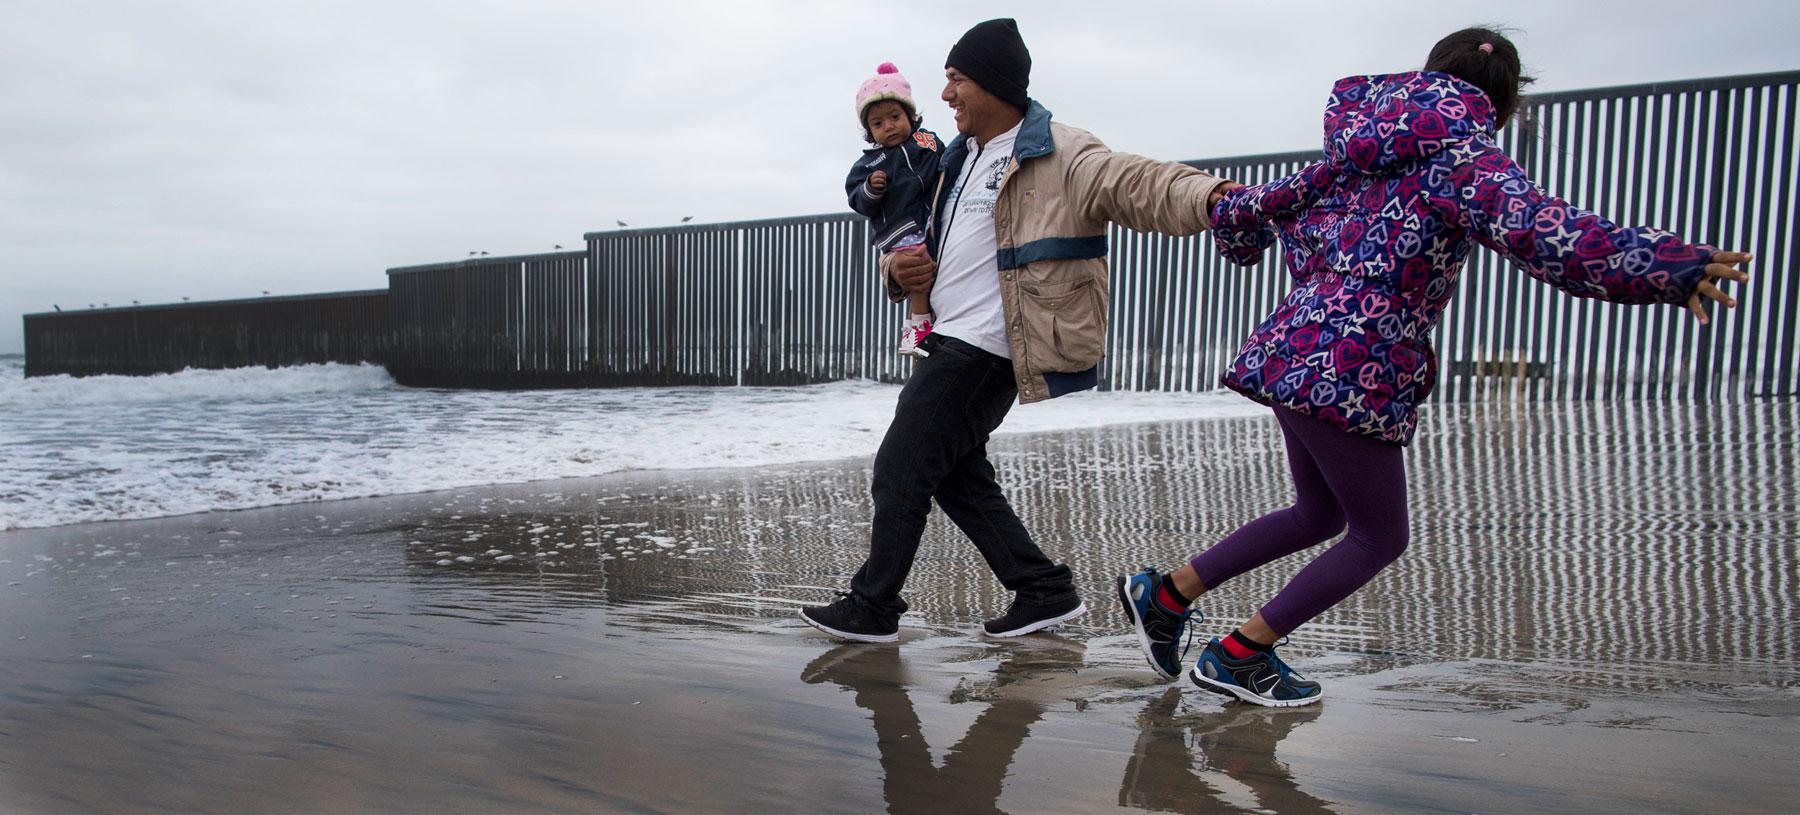 Migrant caravan arrives in Tijuana, Mexico (Photo: Carolyn Van Houten via Getty Images)